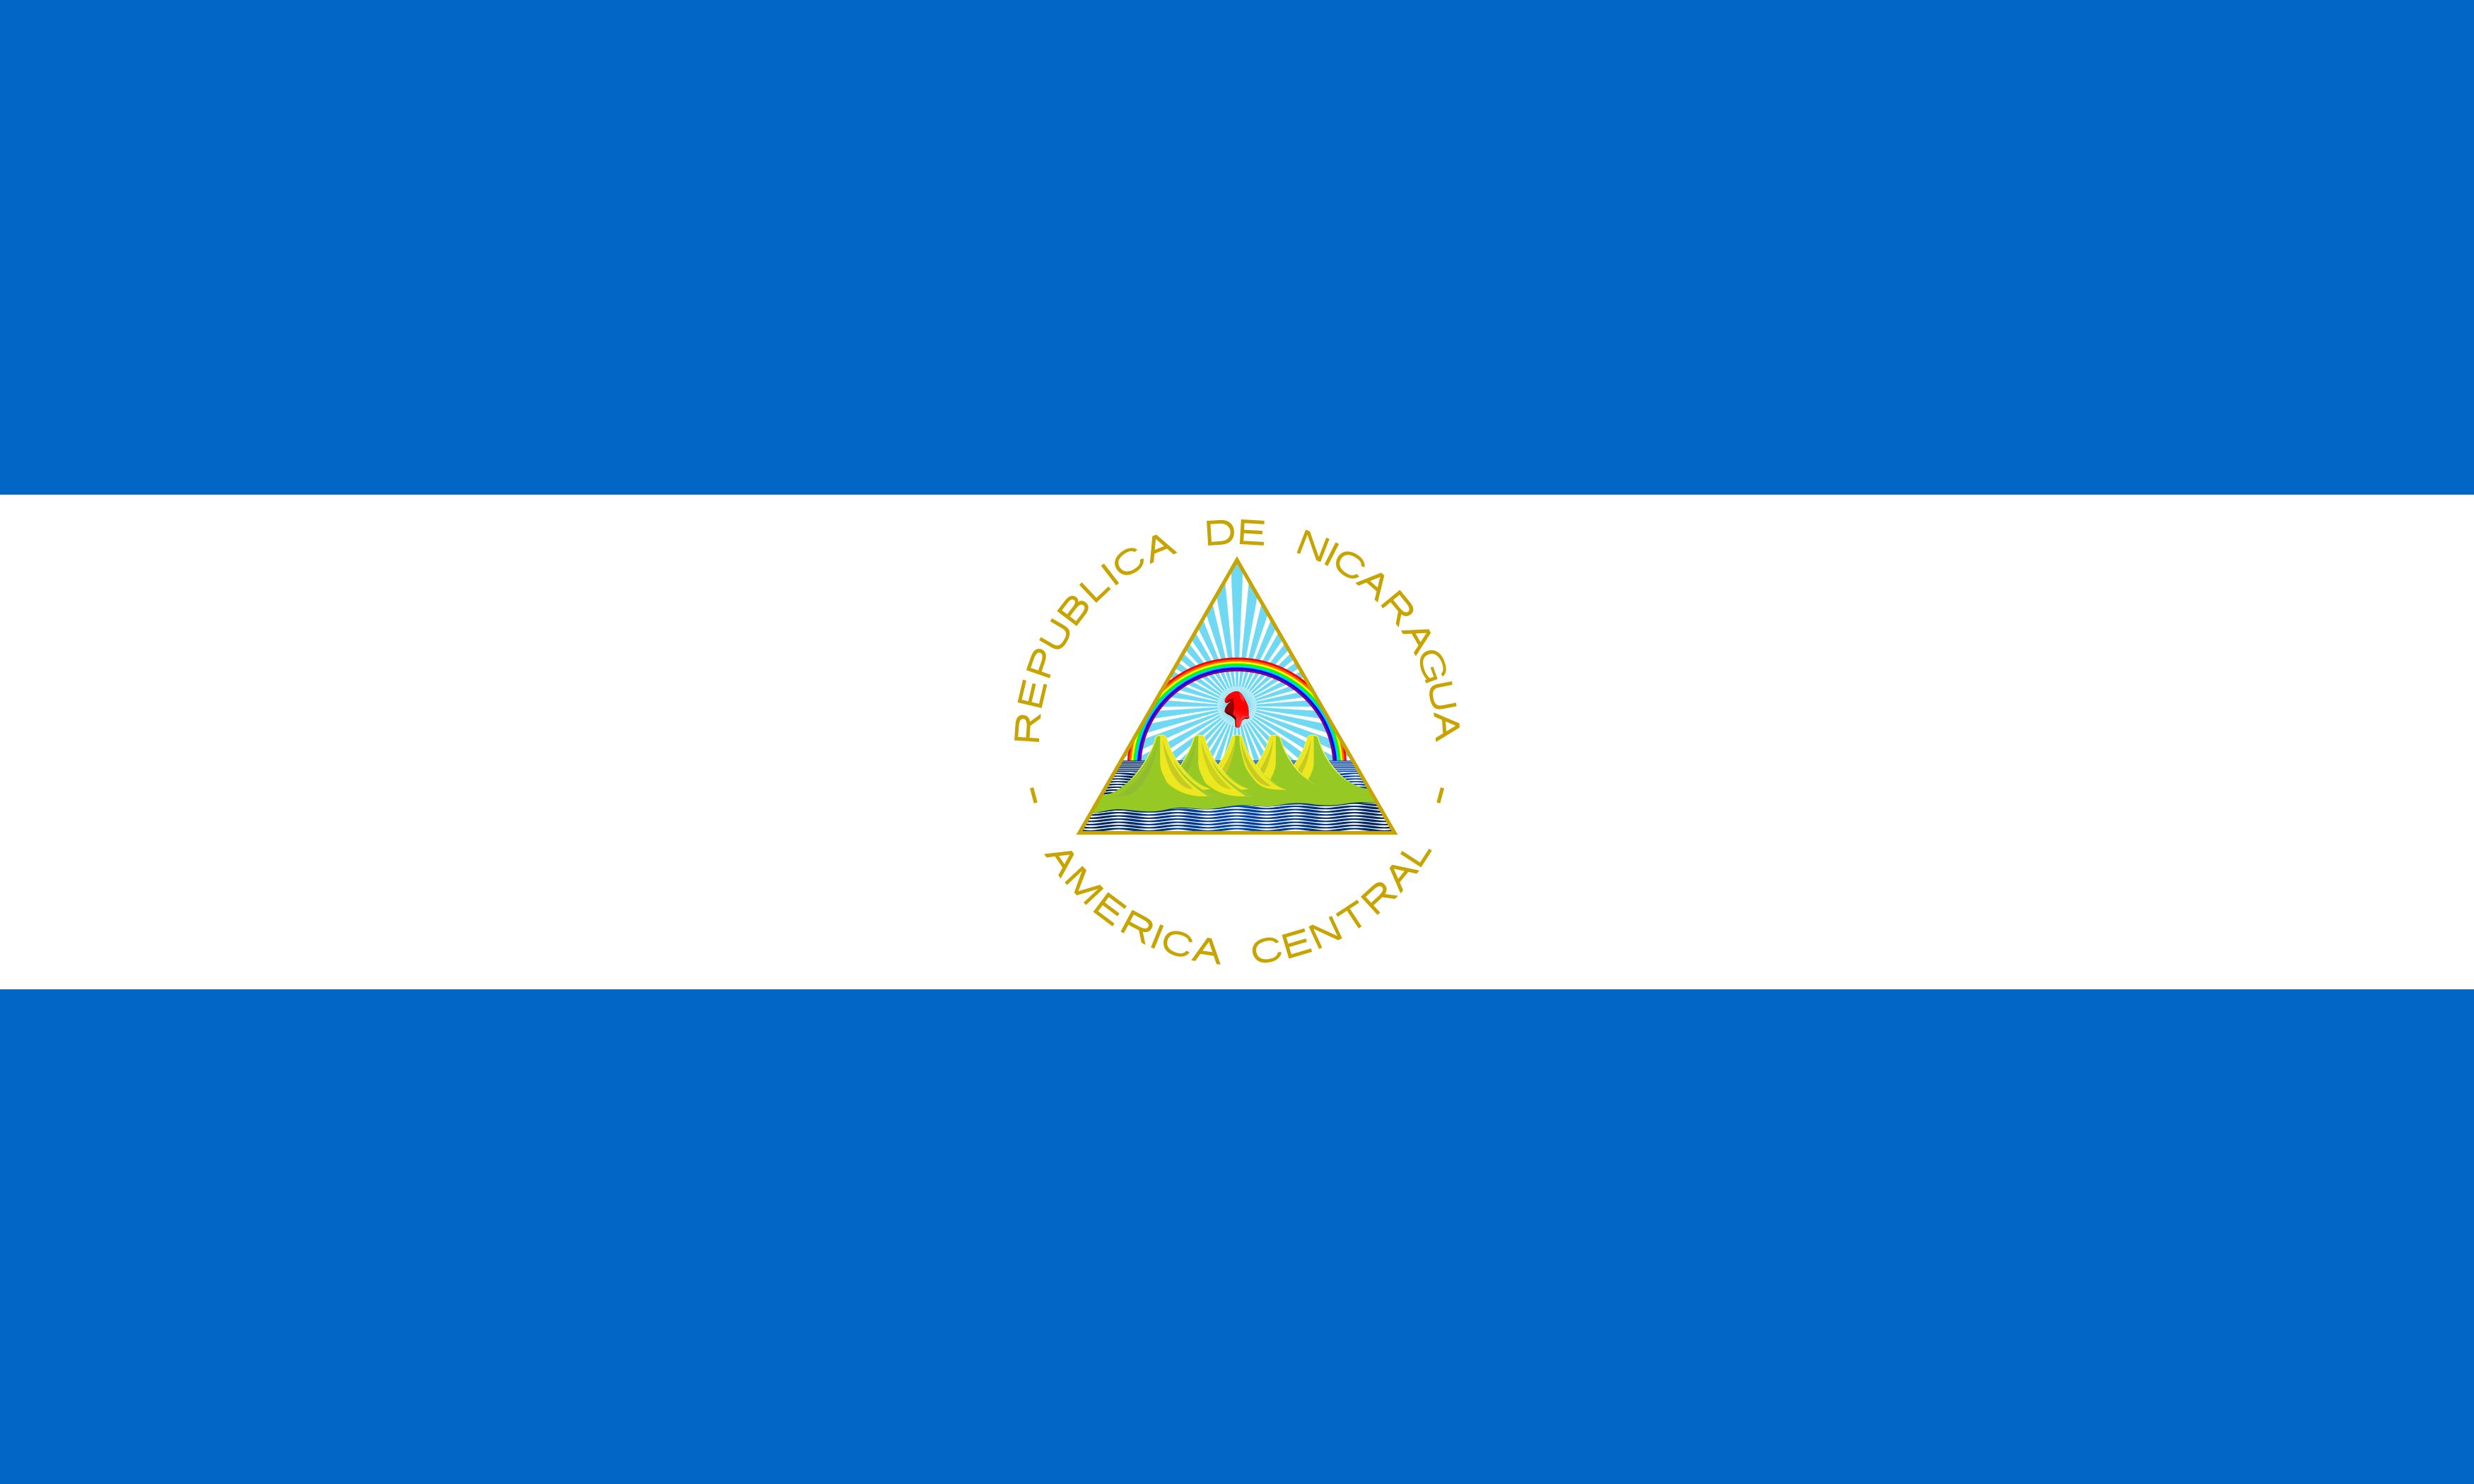 Bandeira da Nicarágua.